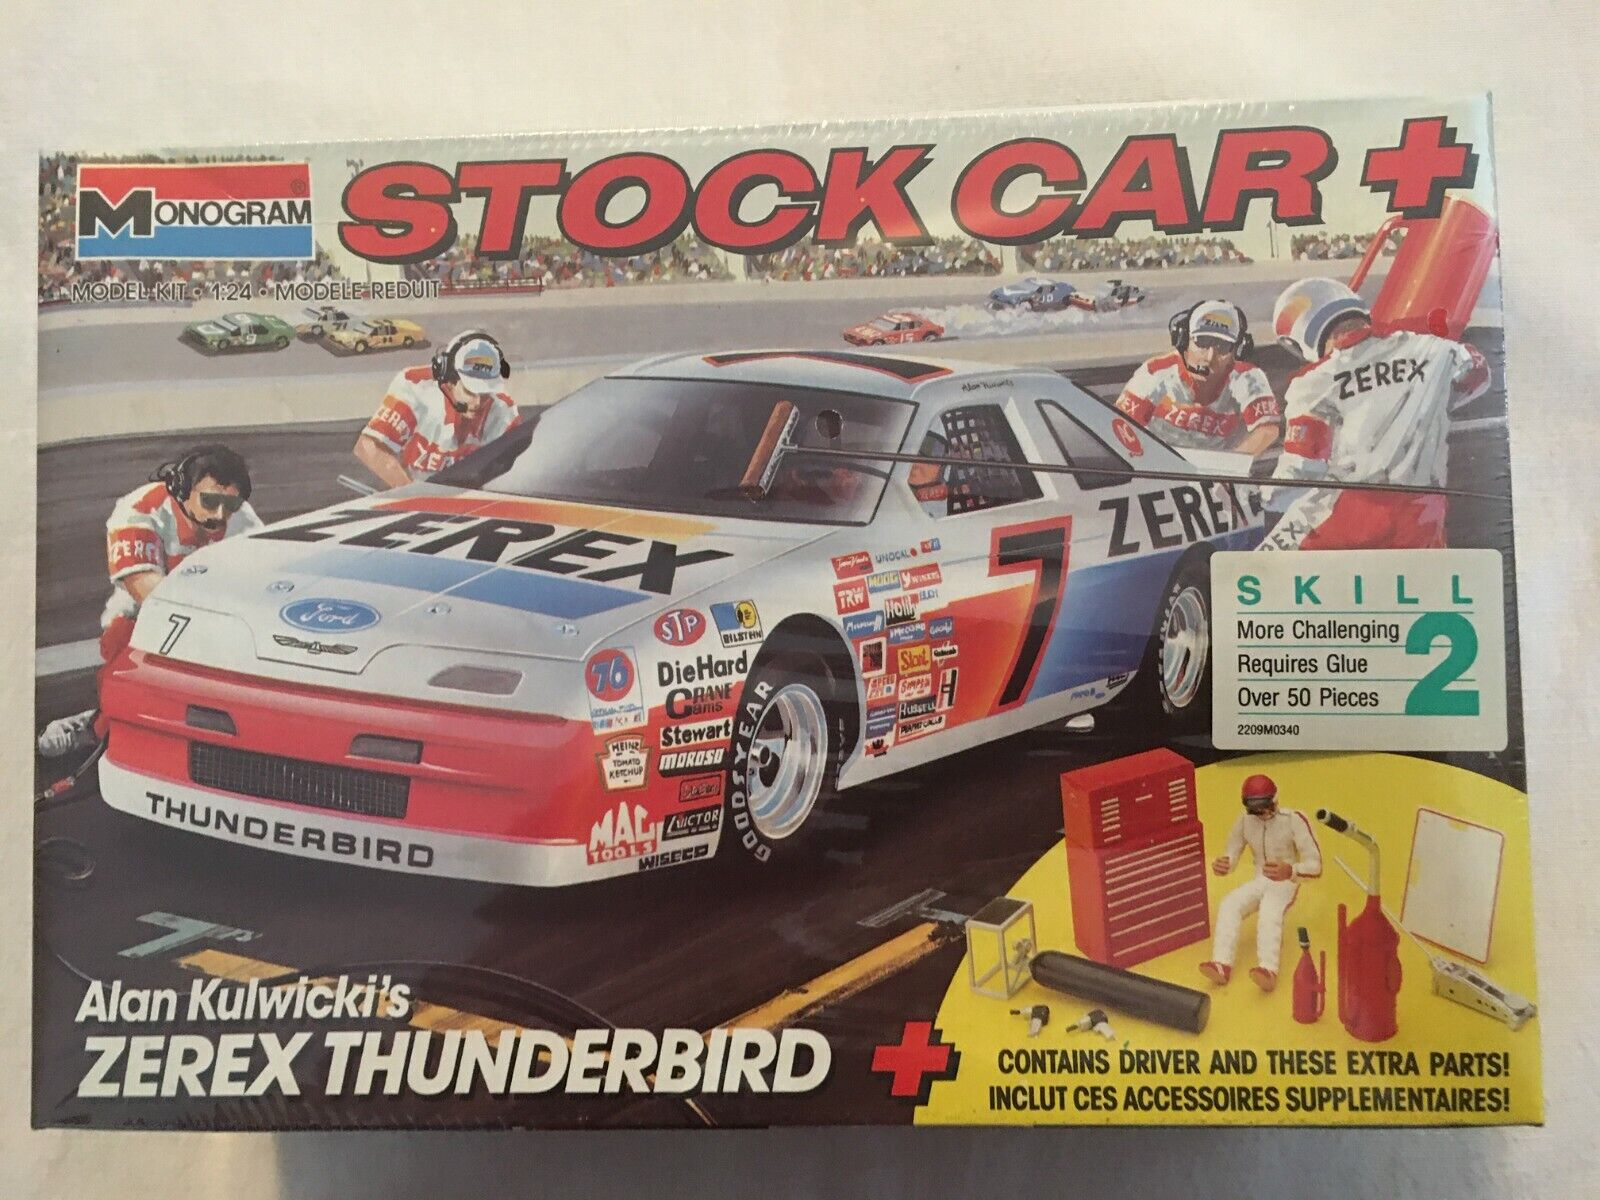 1990 Monogram 7 Alan Kulwicki Zerex Thunderbird Stock Car Kit - $17.50